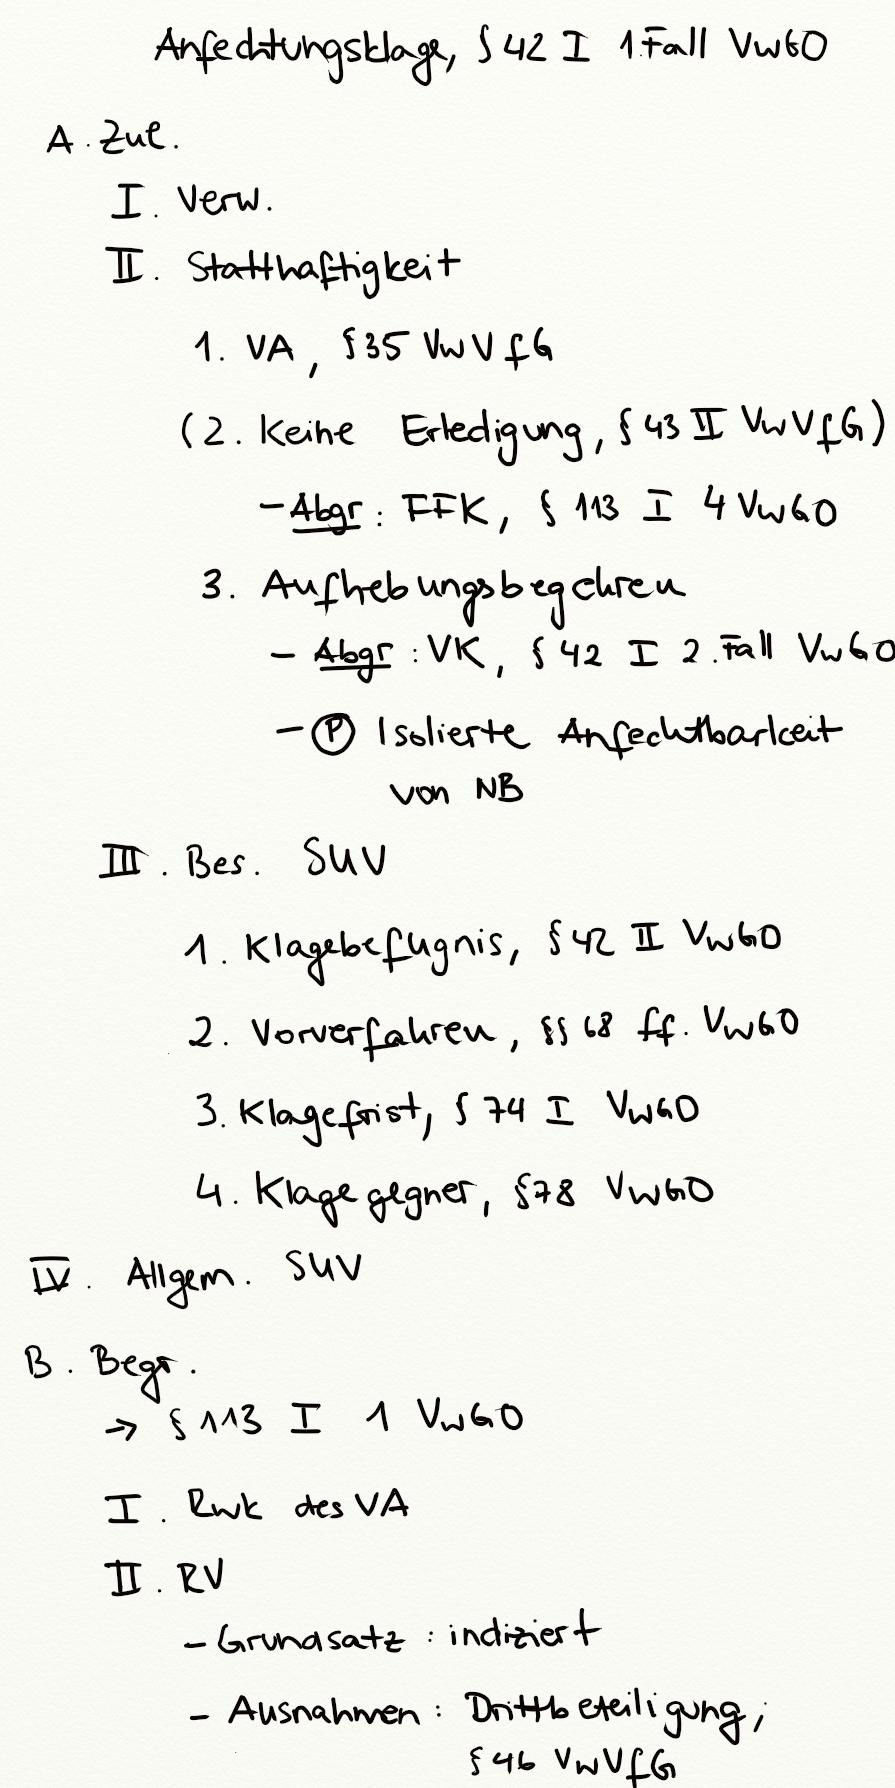 Anfechtungsklage 42 I 1 Fall Vwgo Exkurs Jura Online